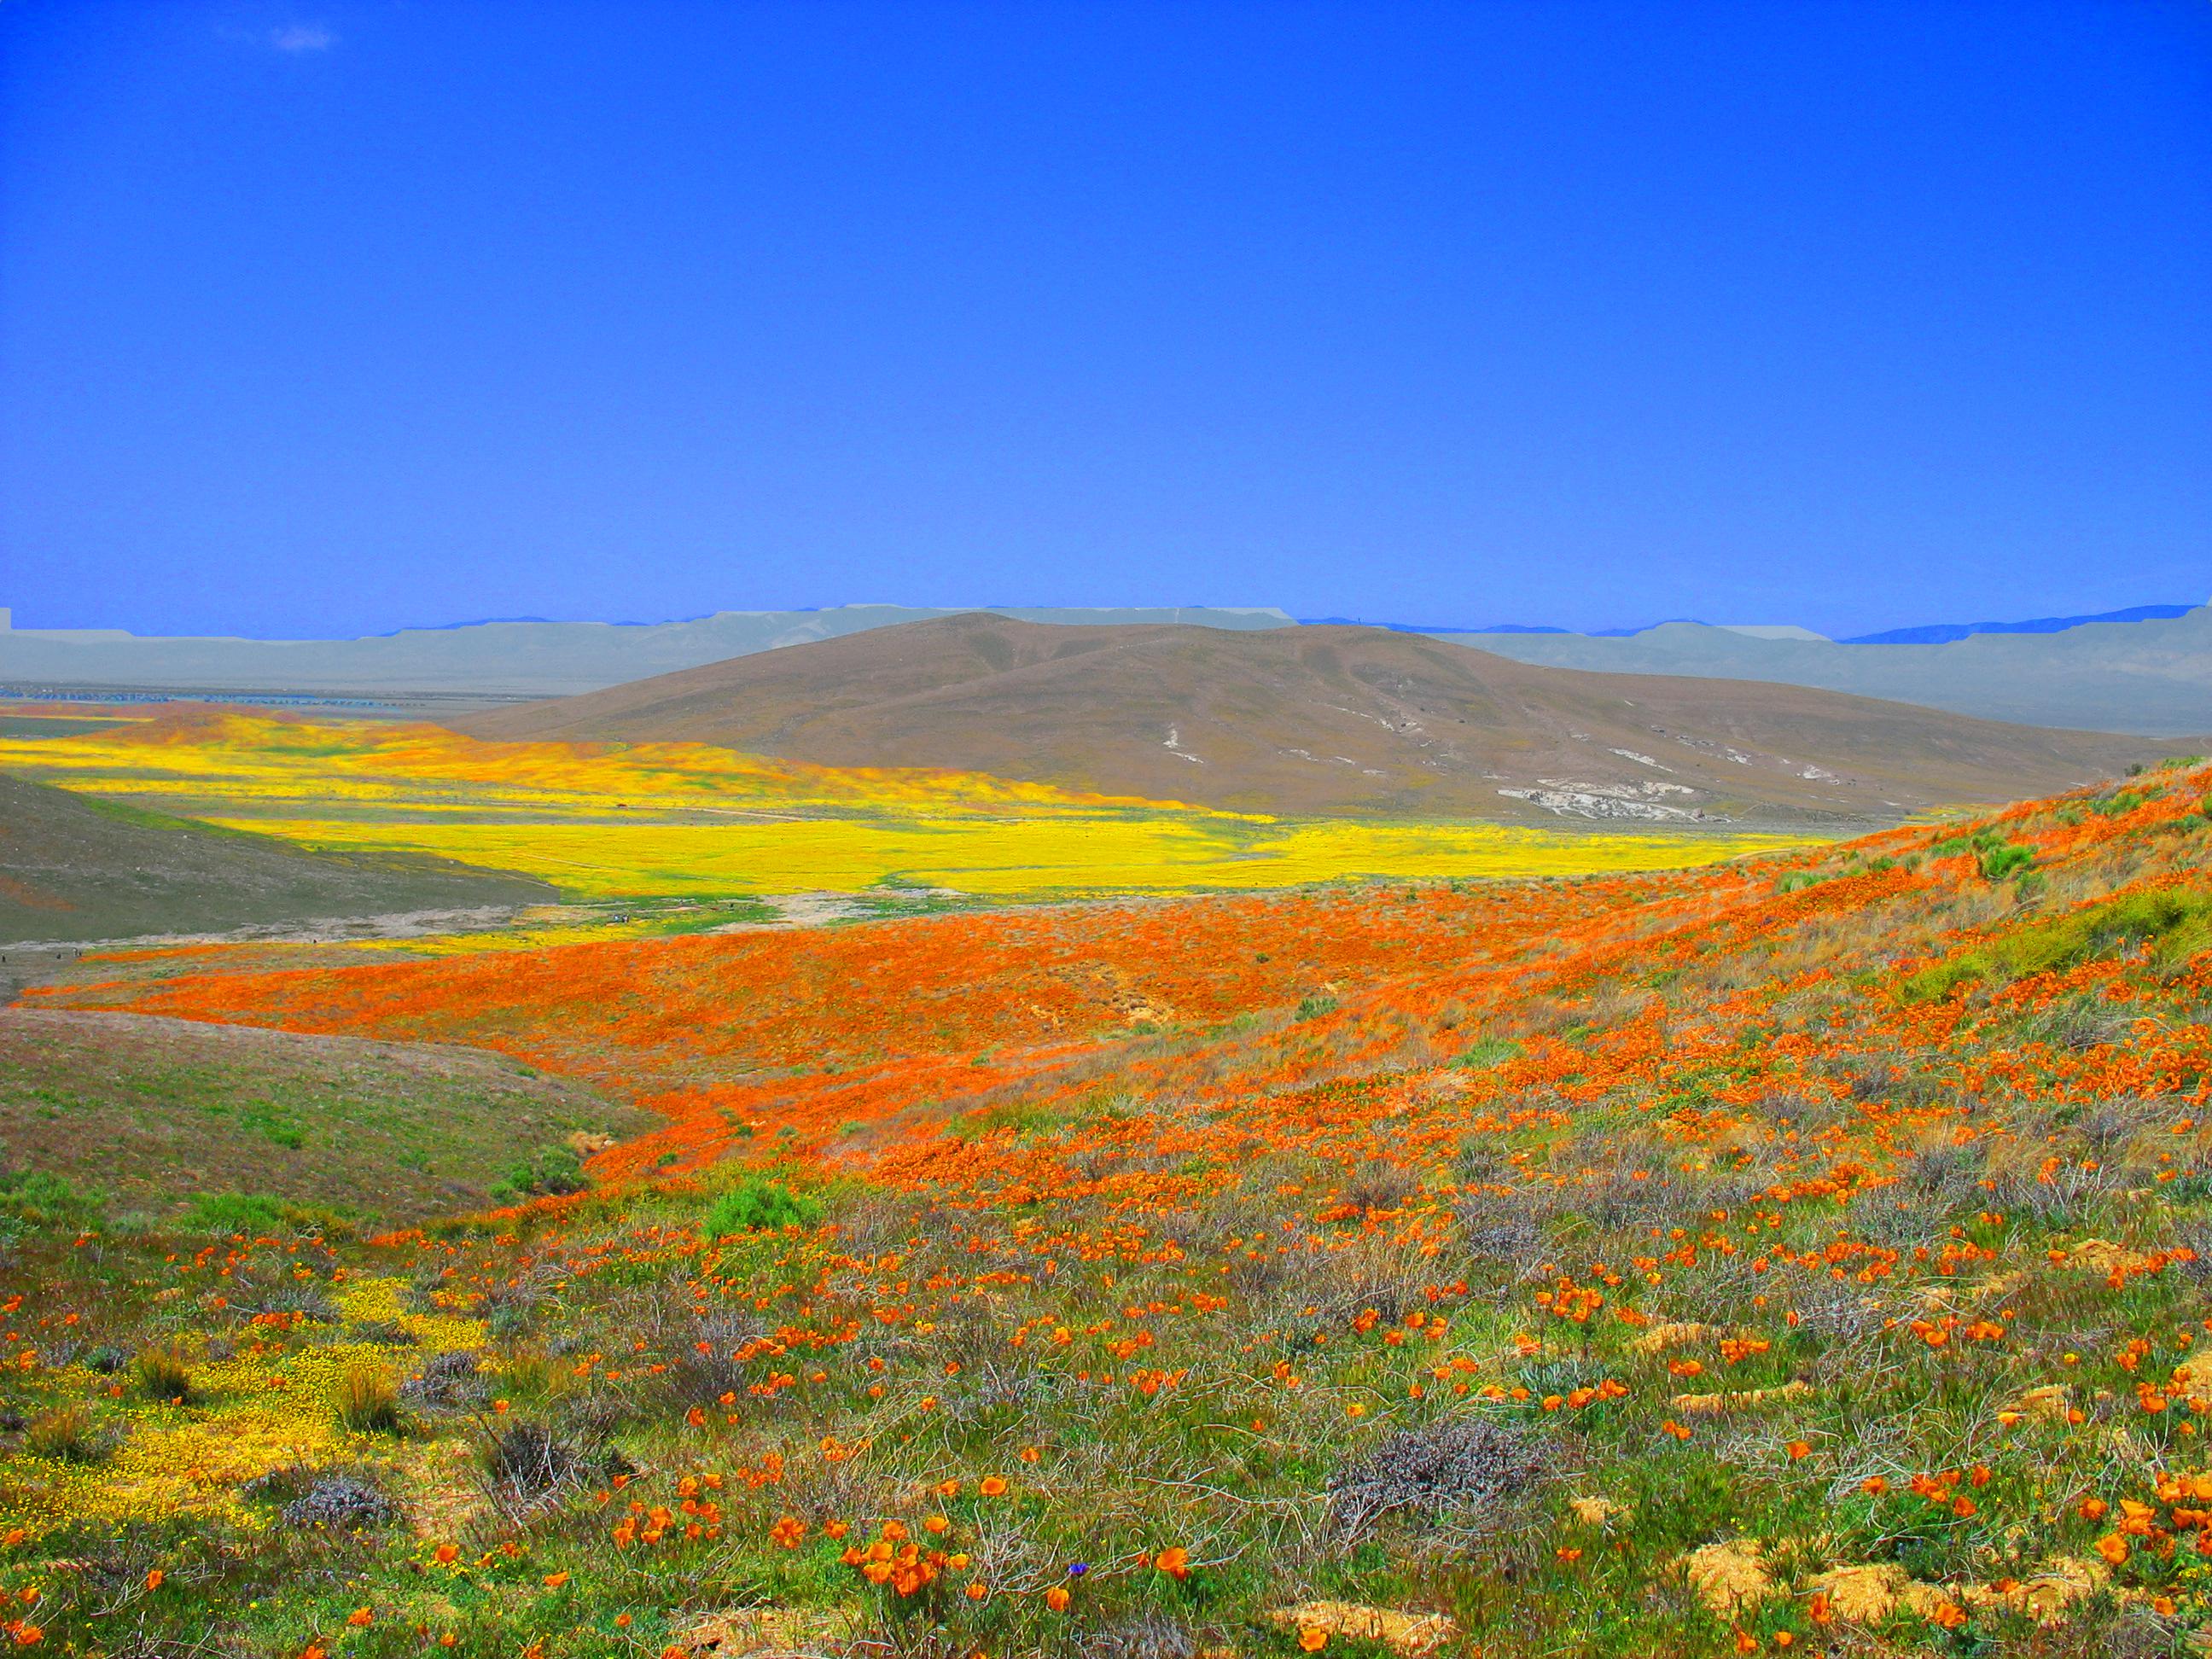 antelope valley에 대한 이미지 검색결과